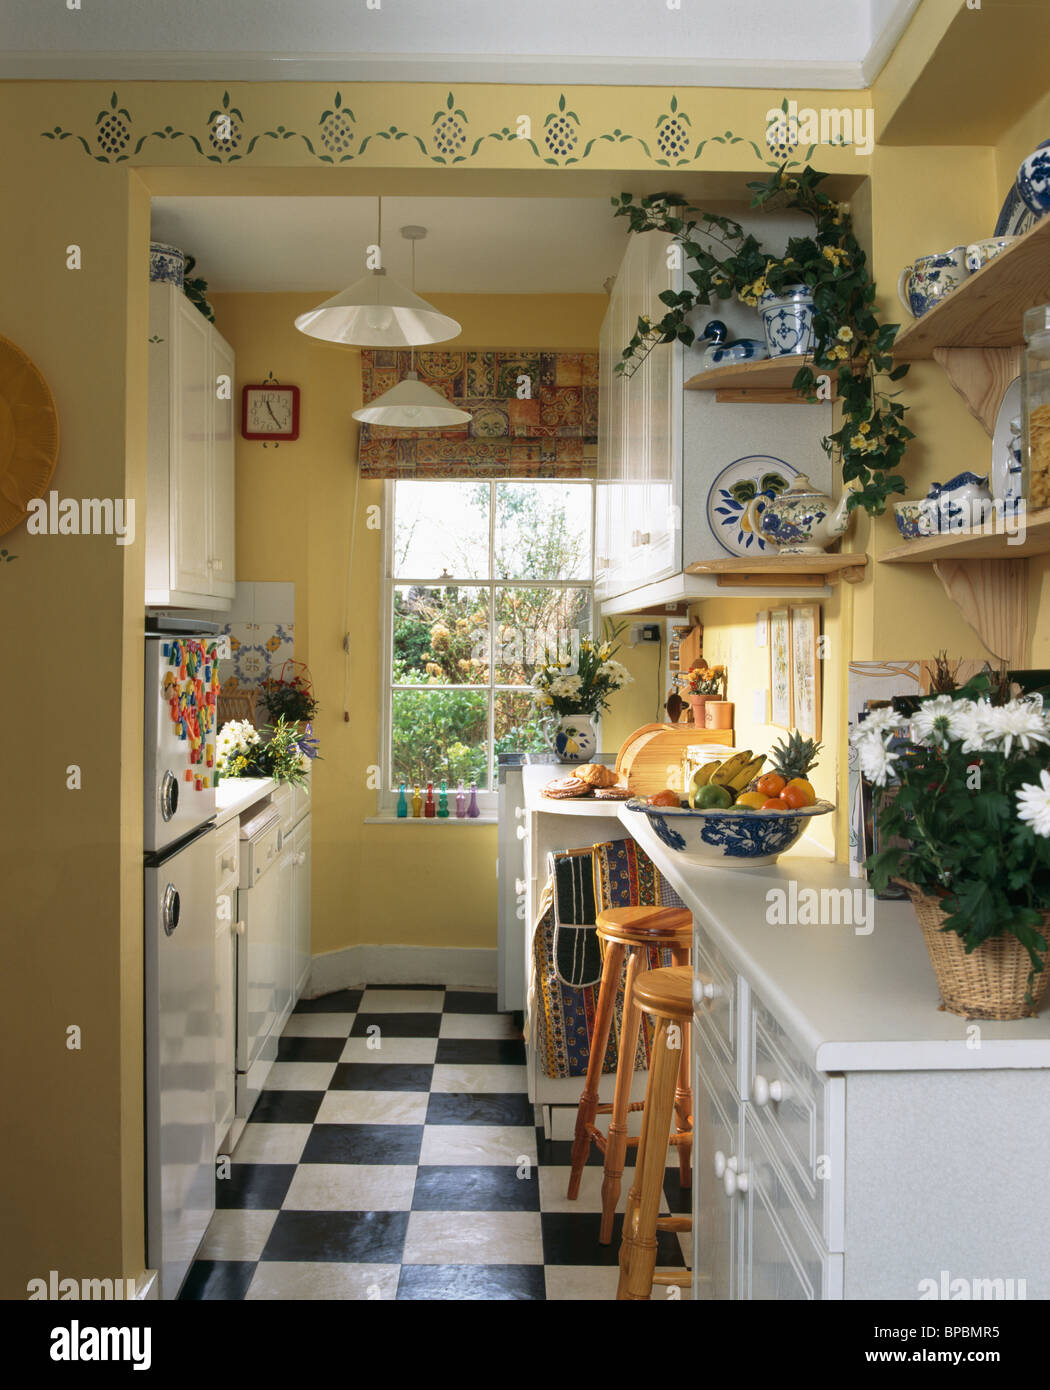 Black+white vinyl flooring in yellow galley kitchen with white ...